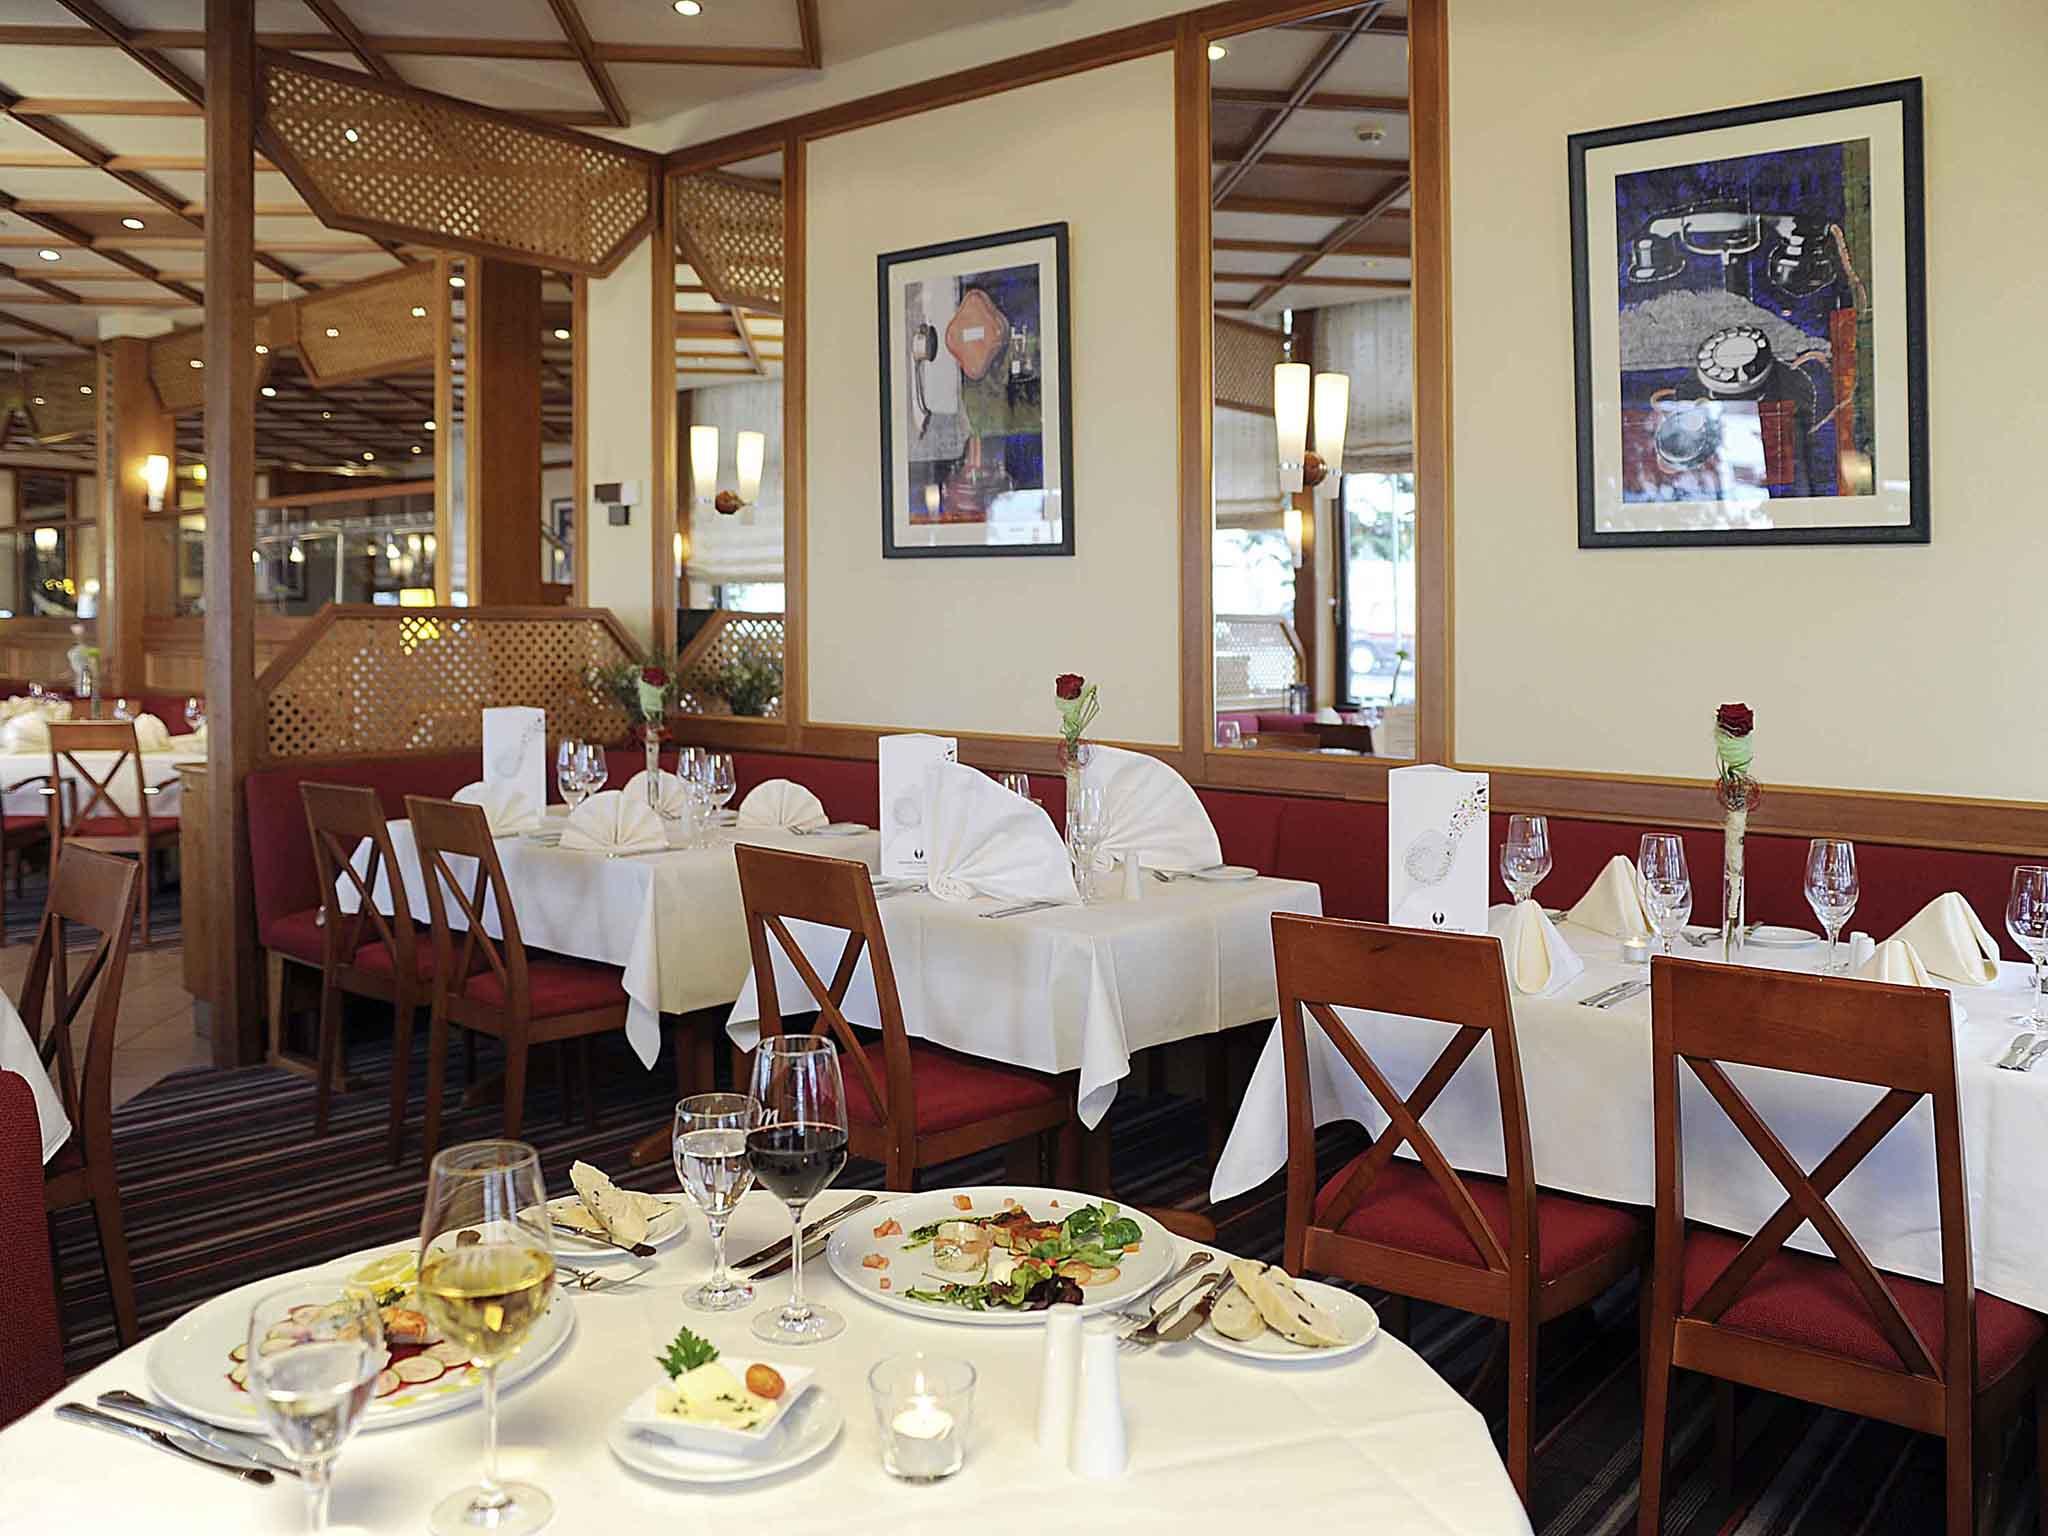 ... Restaurant   Mercure Hotel Bad Homburg Friedrichsdorf ...